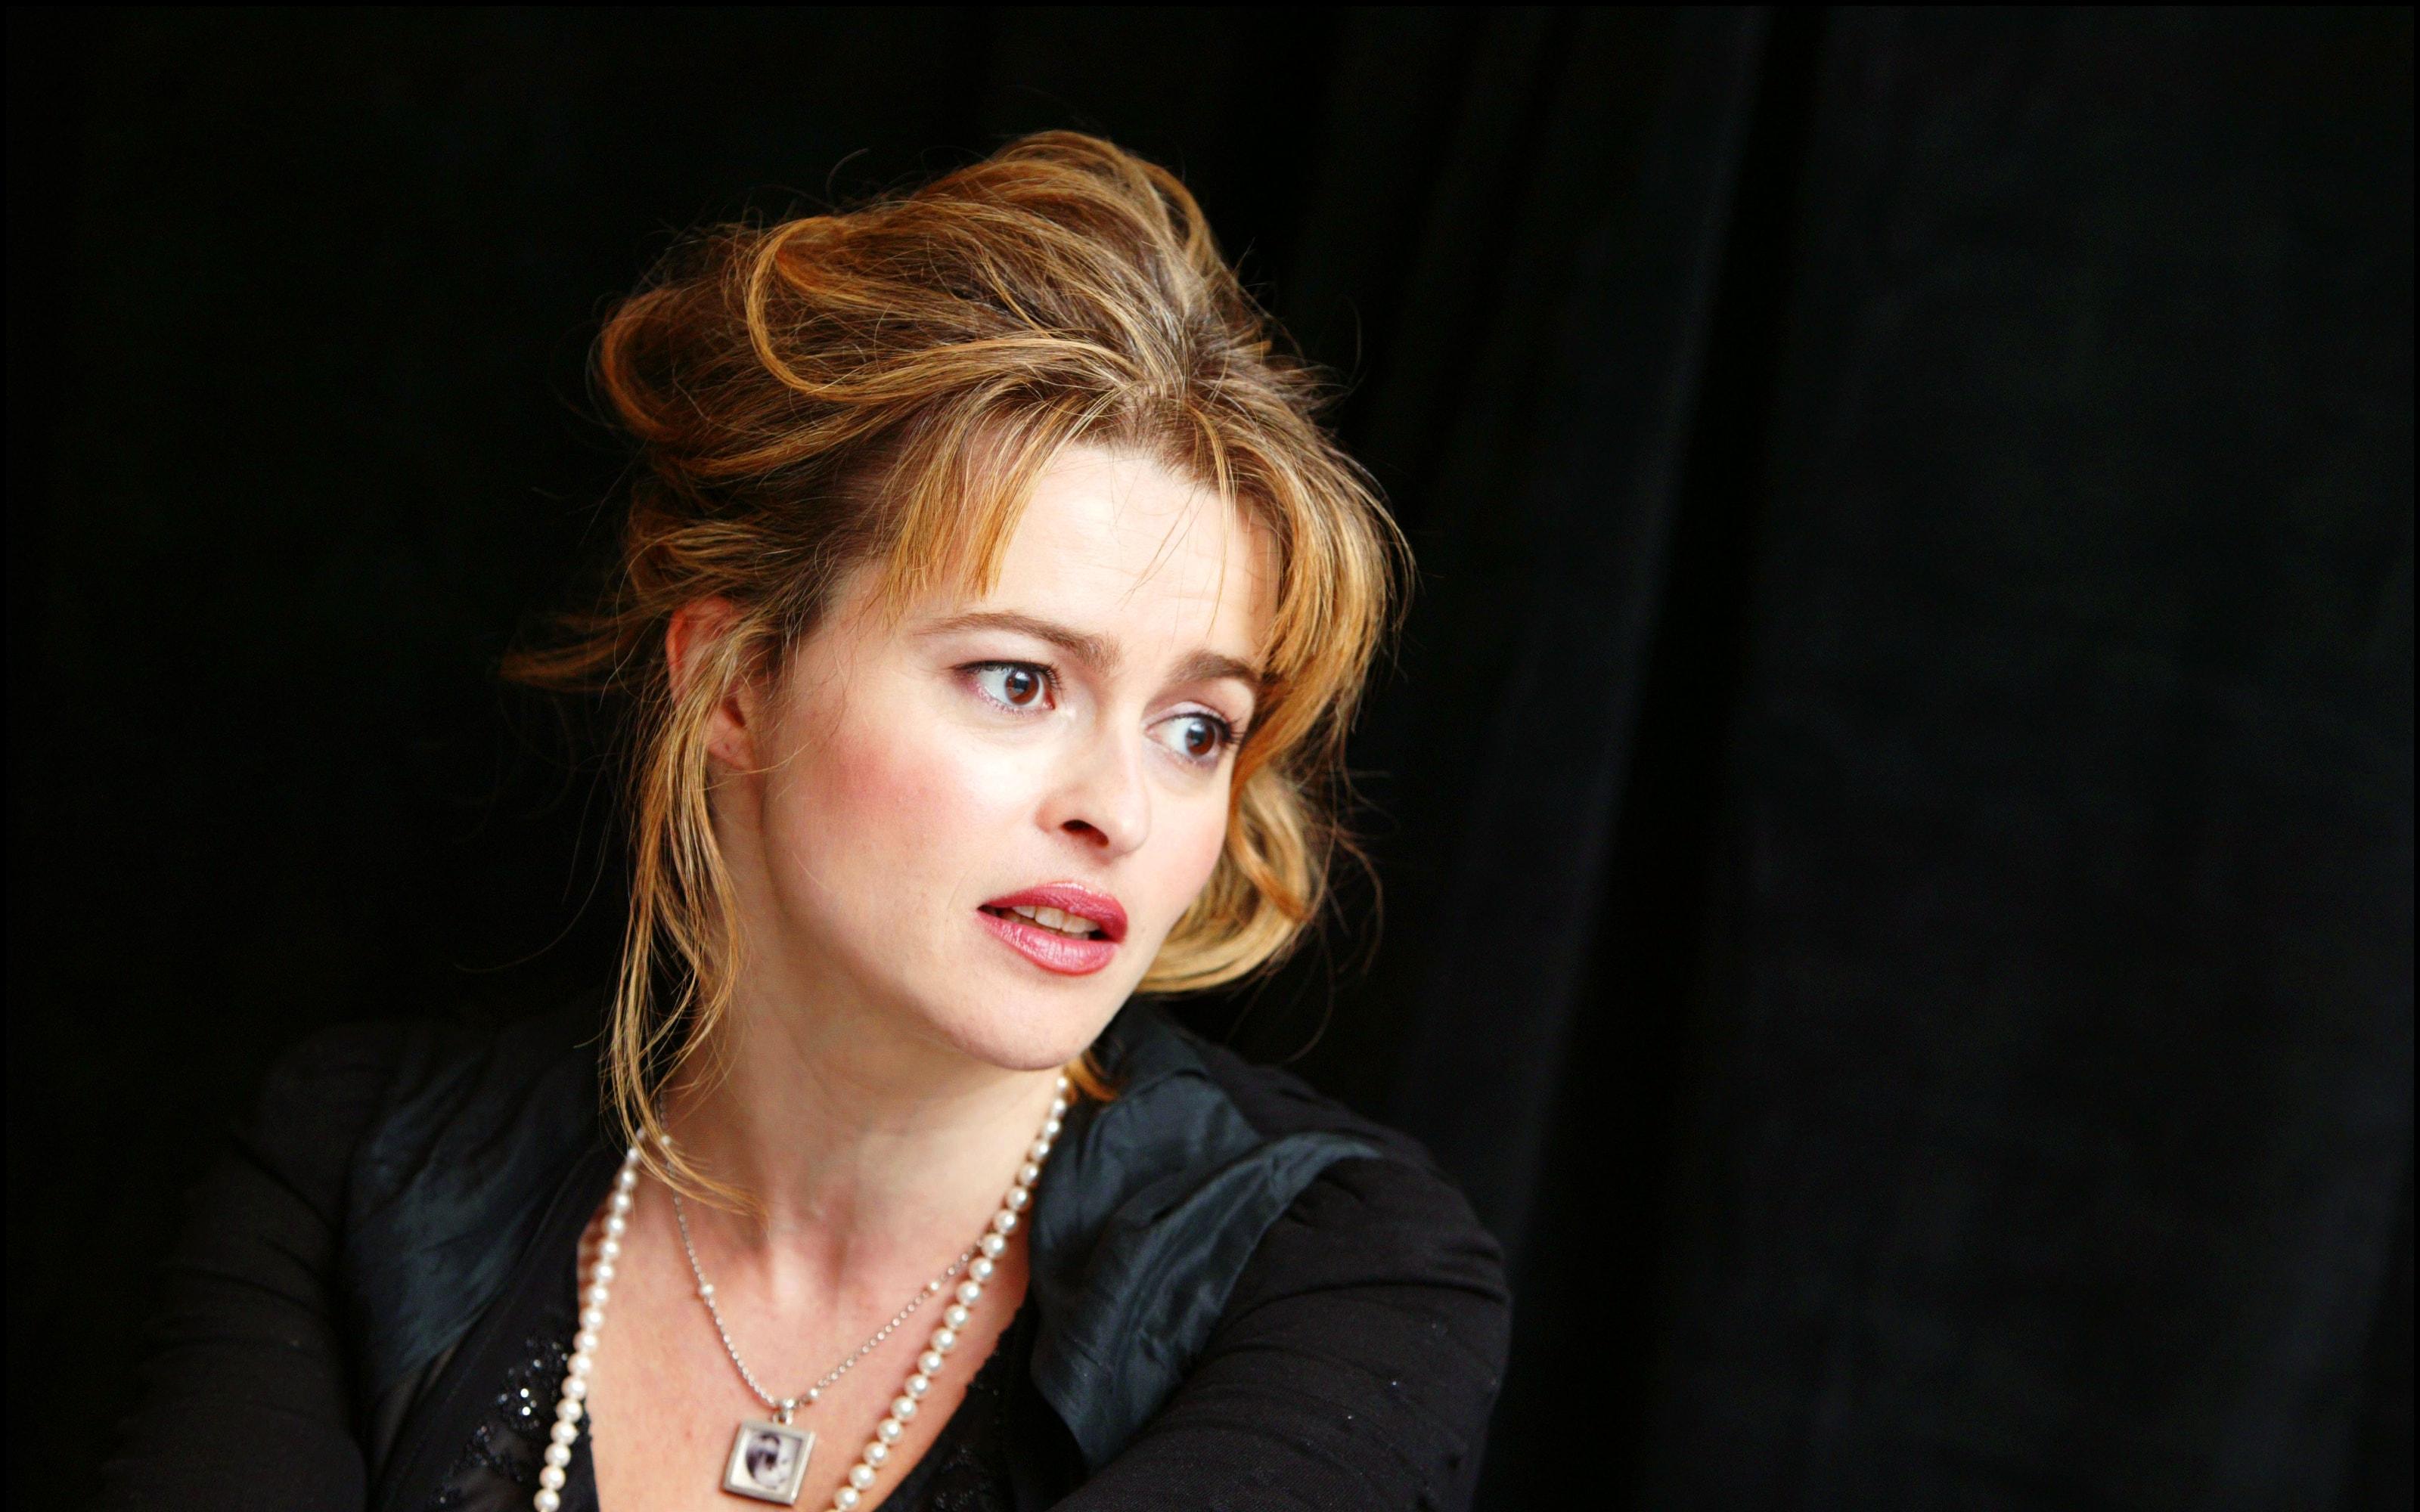 Helena Bonham Carter HD Wallpapers | 7wallpapers.net